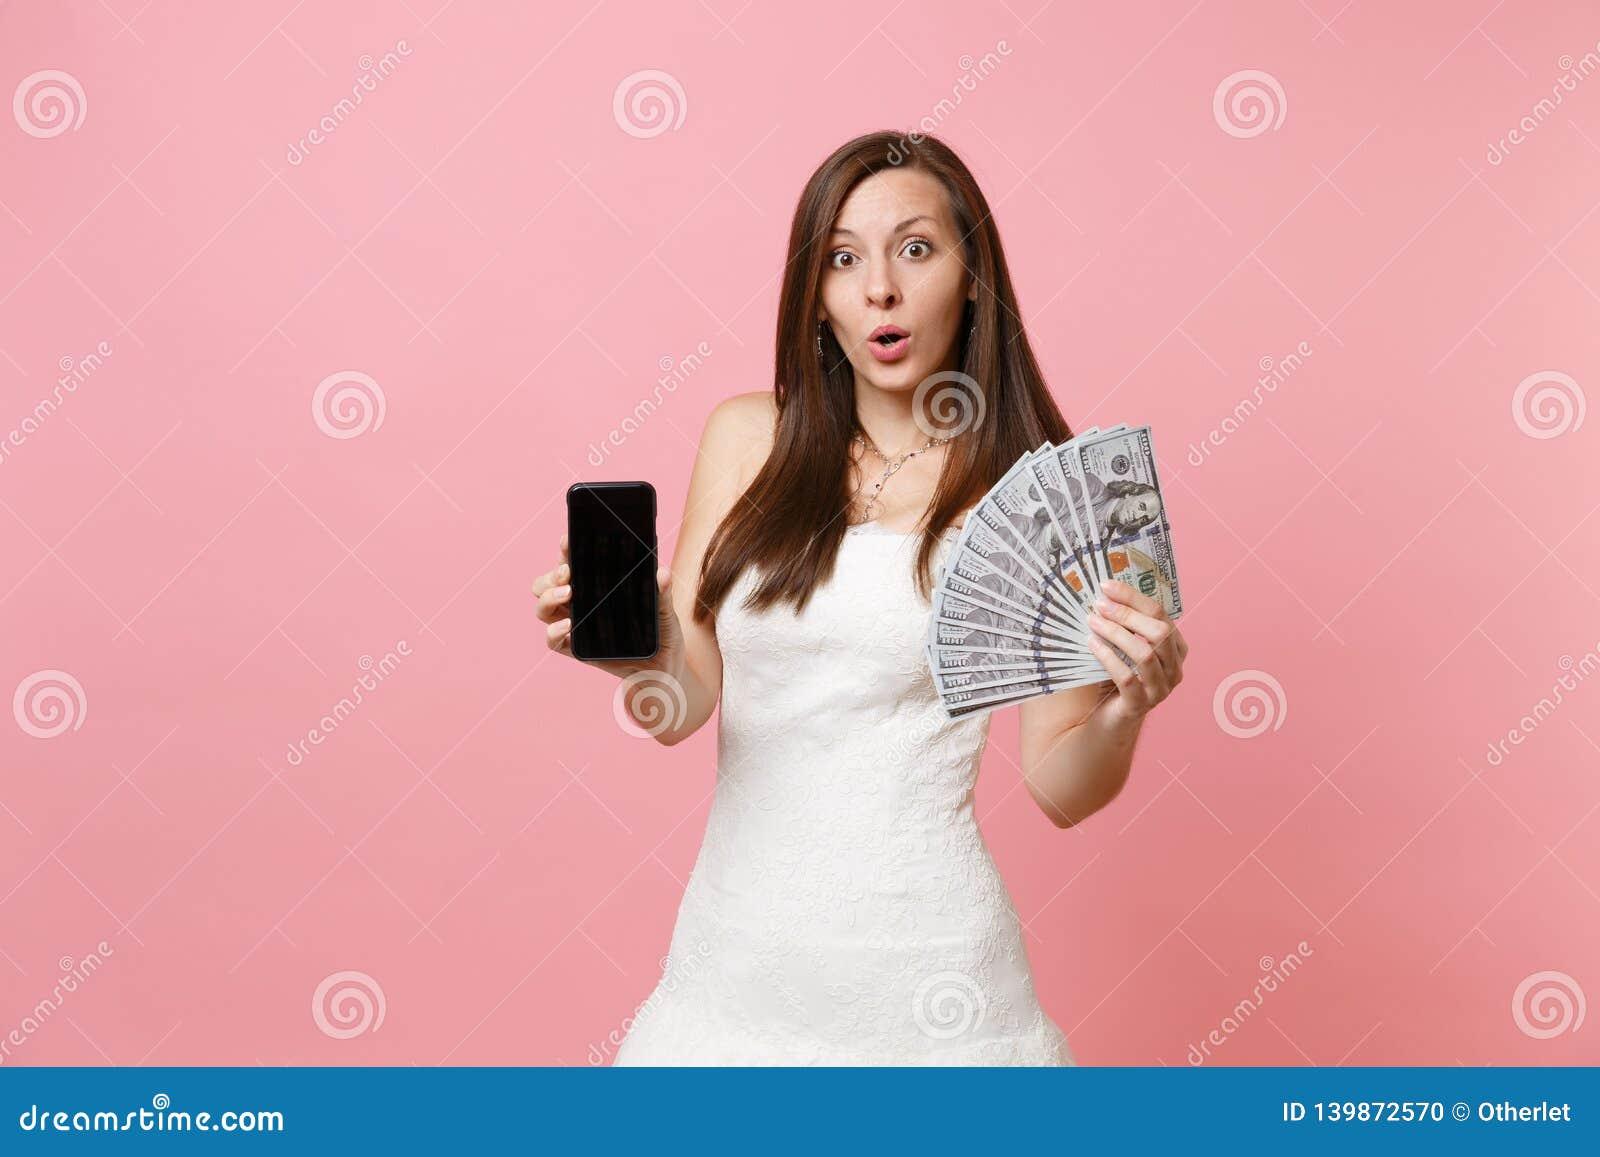 Shocked Bride Woman In Wedding Dress Holding Bundle Lots Of Dollars